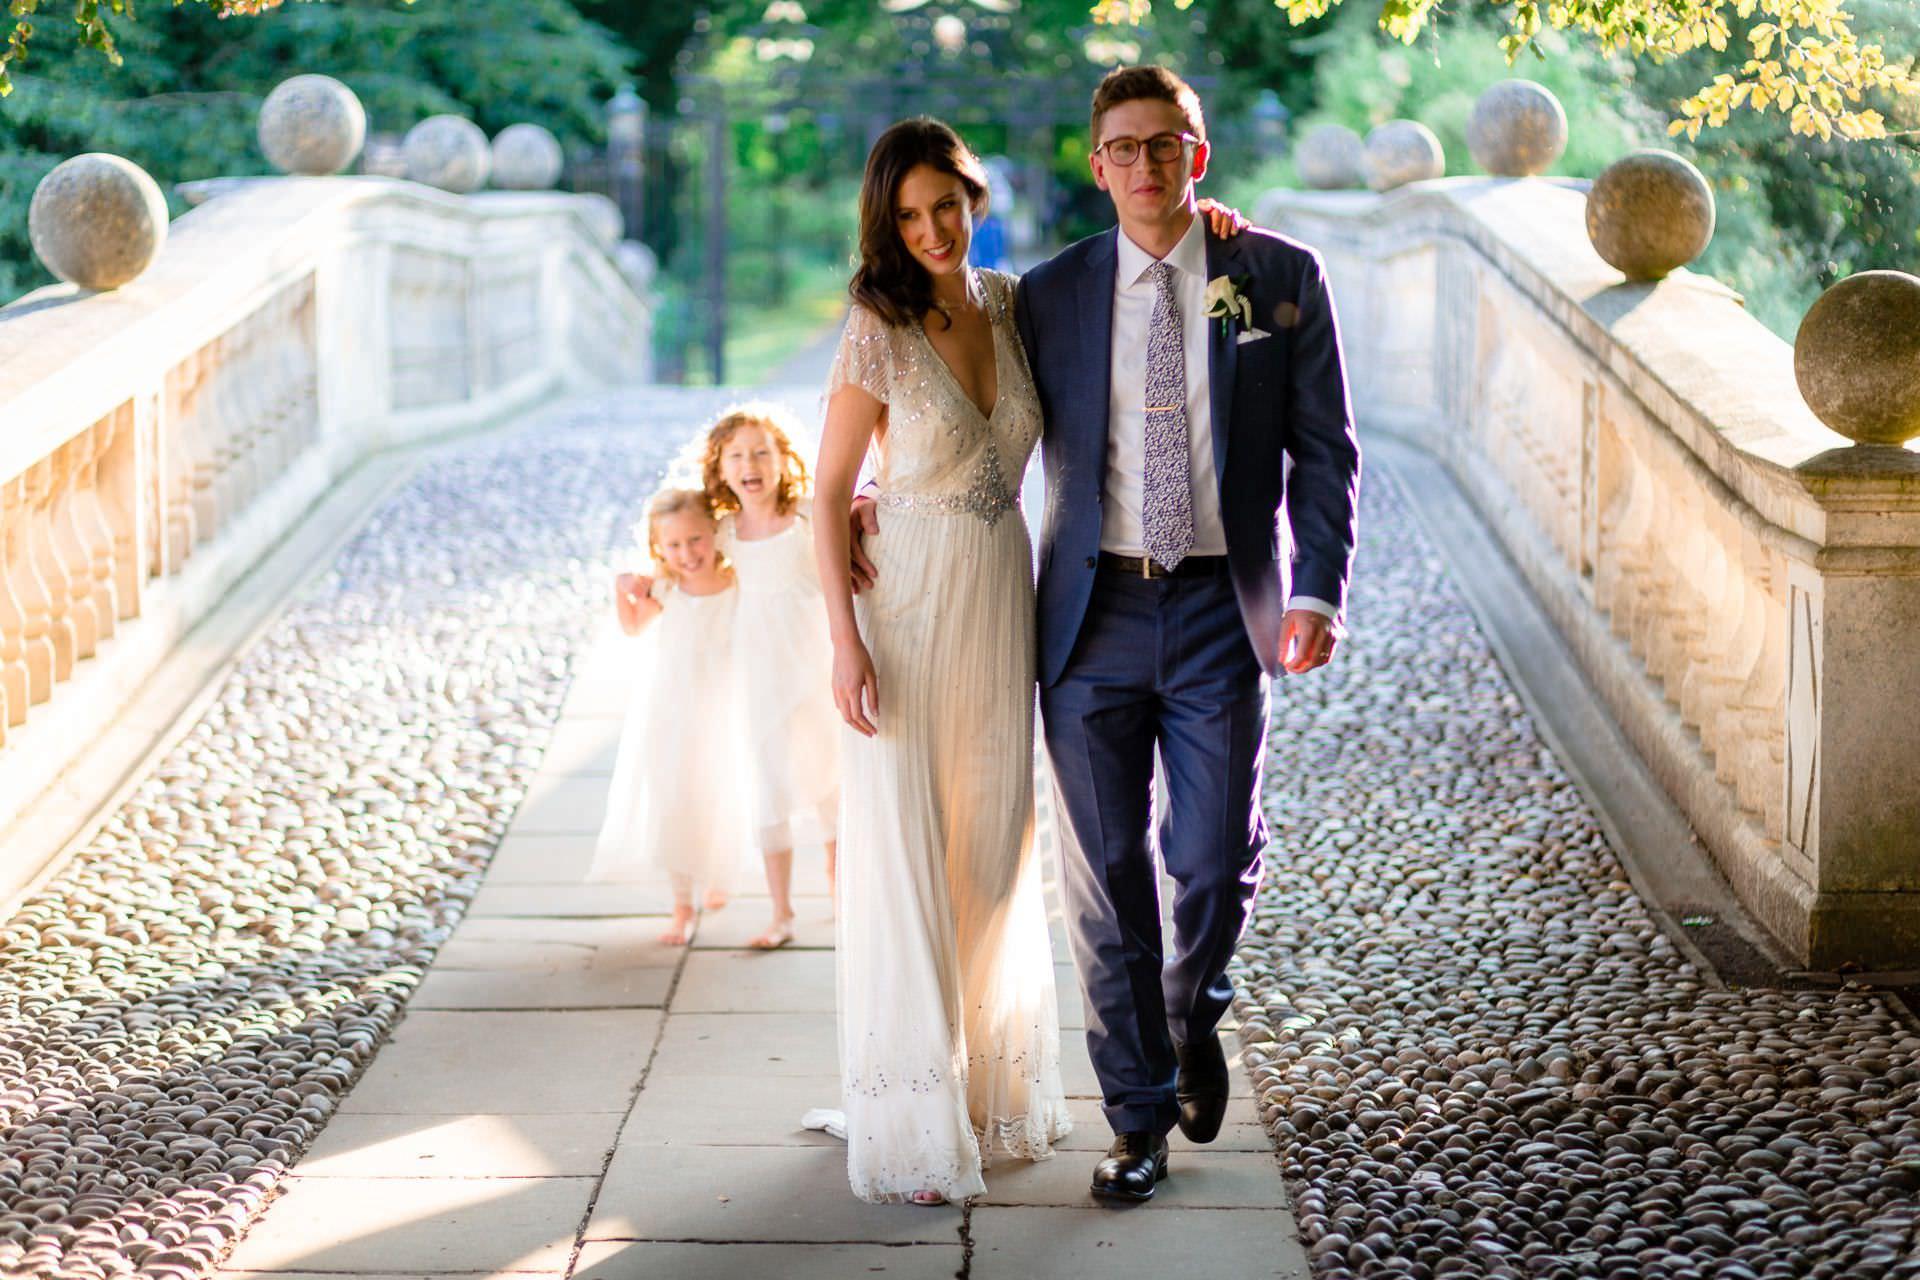 London Wedding Photography Prices Couple Walking on the bridge